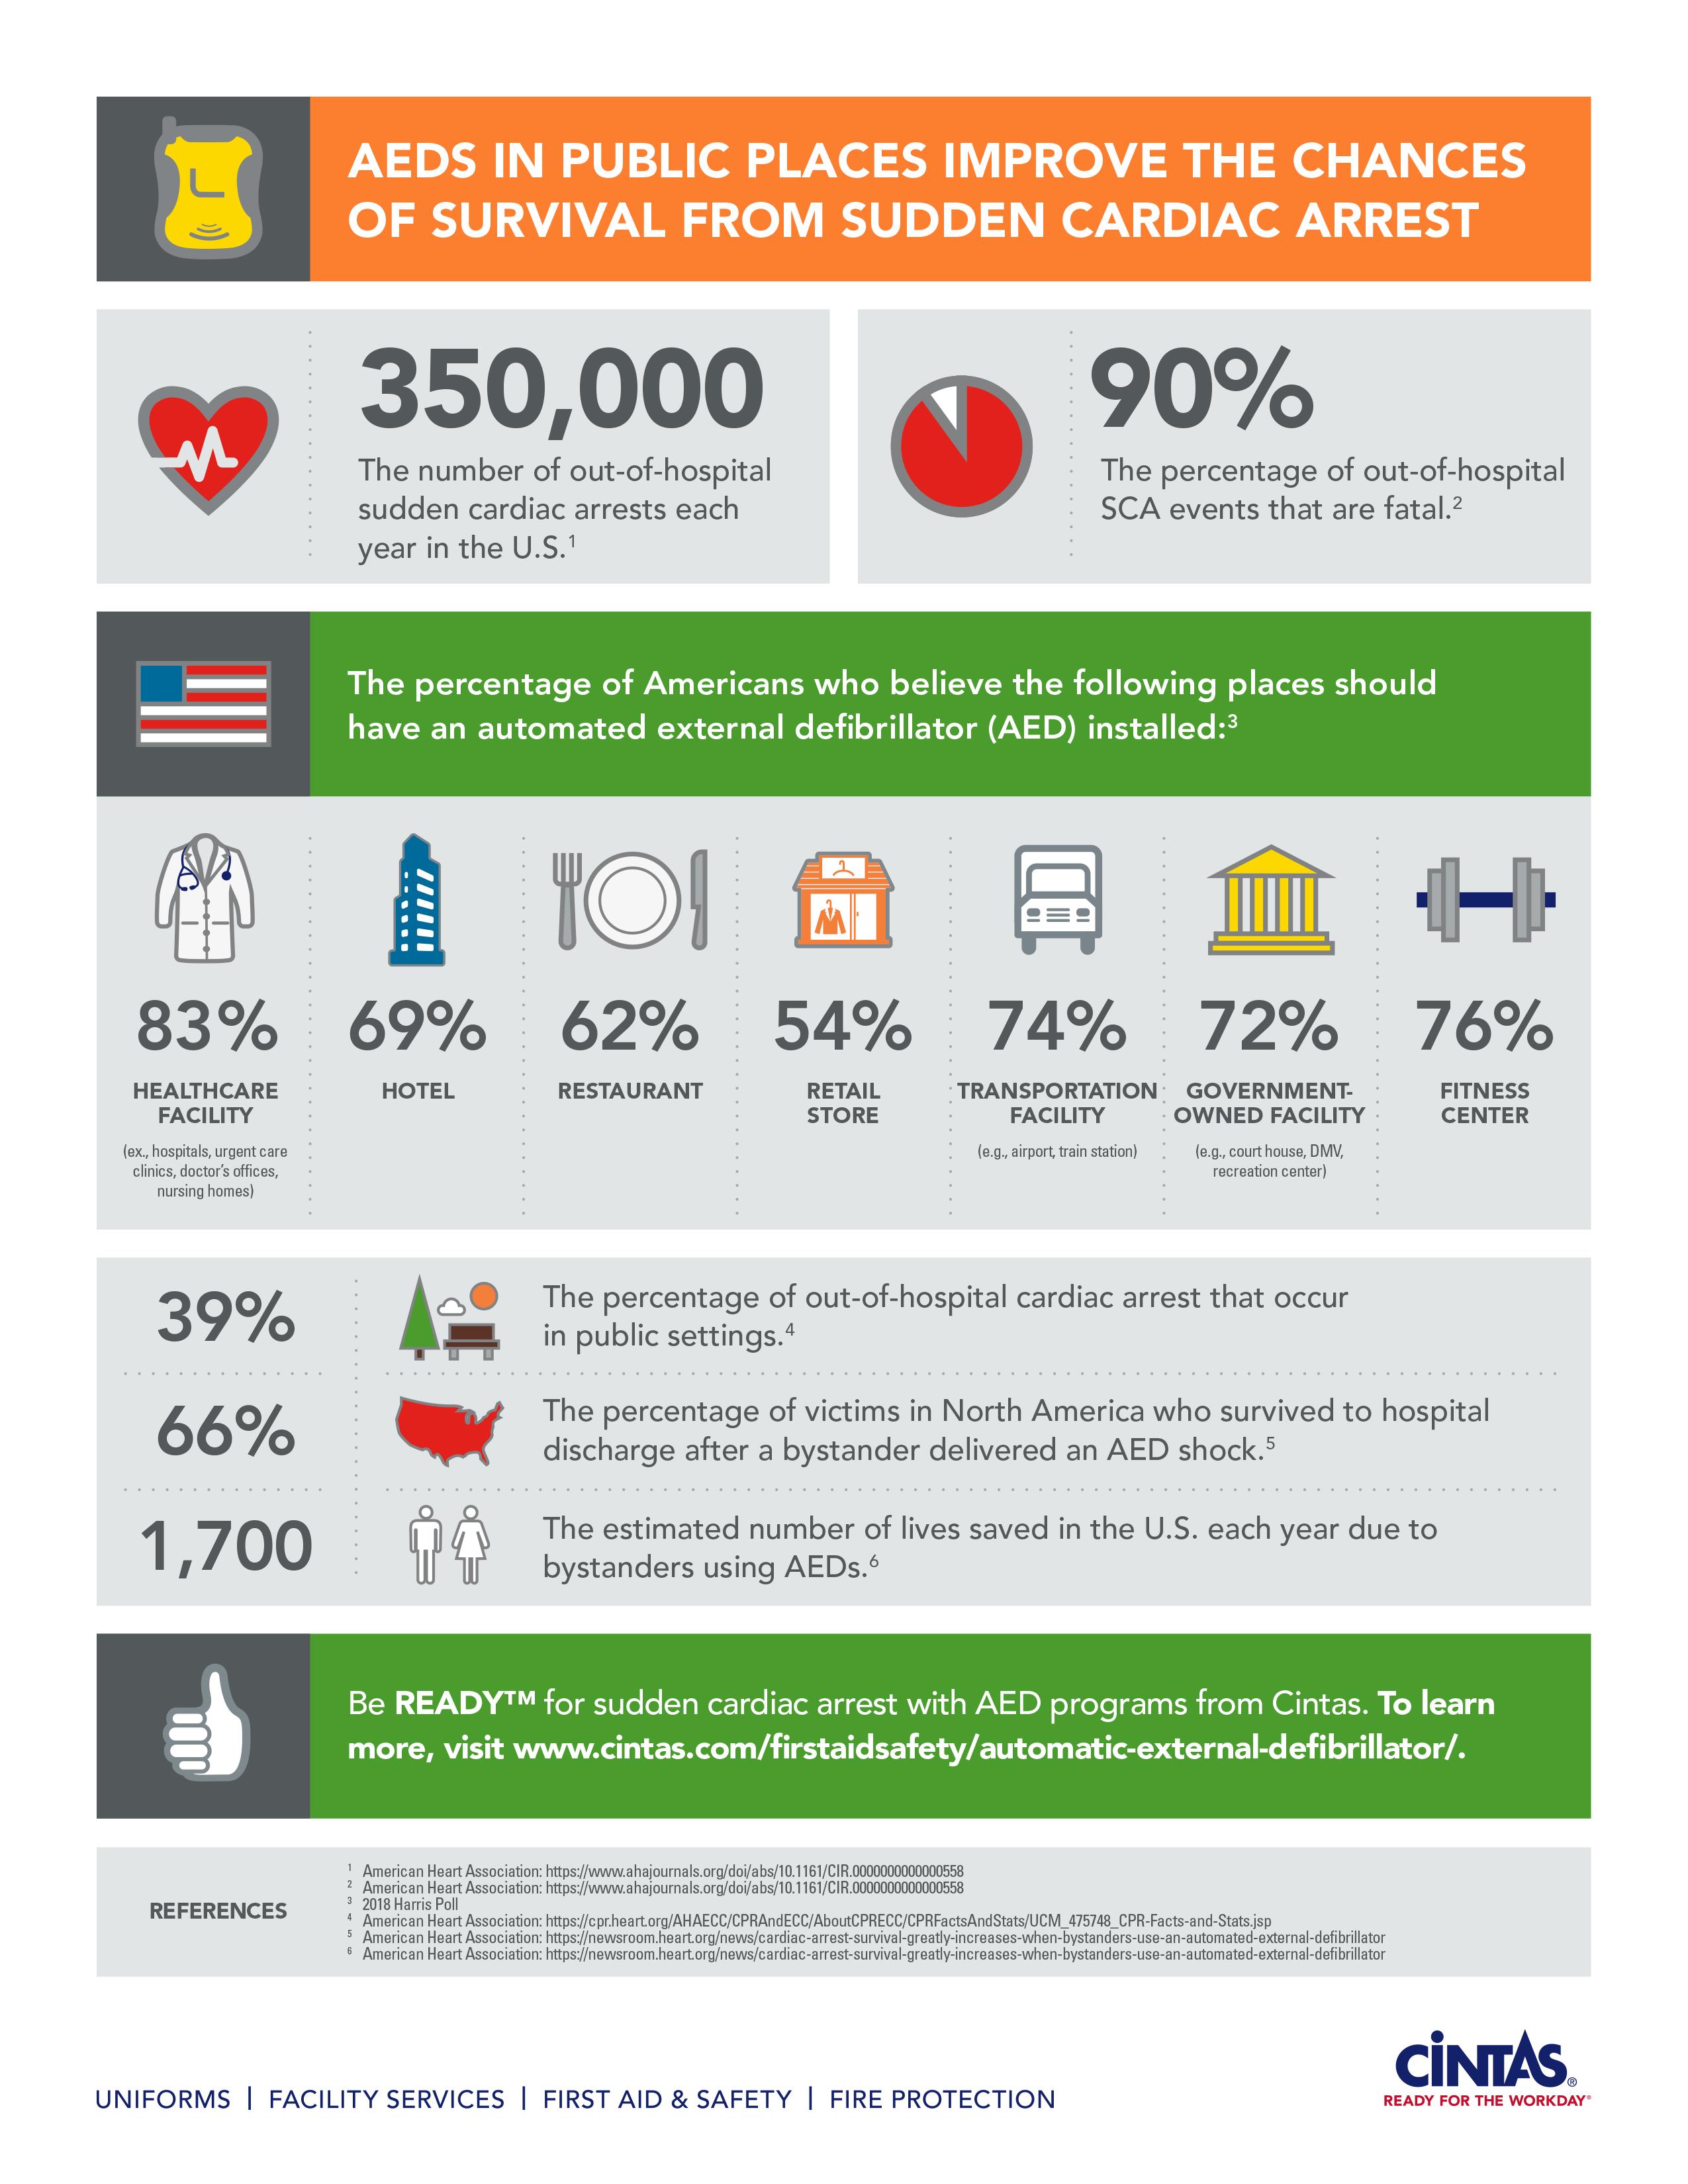 Cintas AEDs Infographic